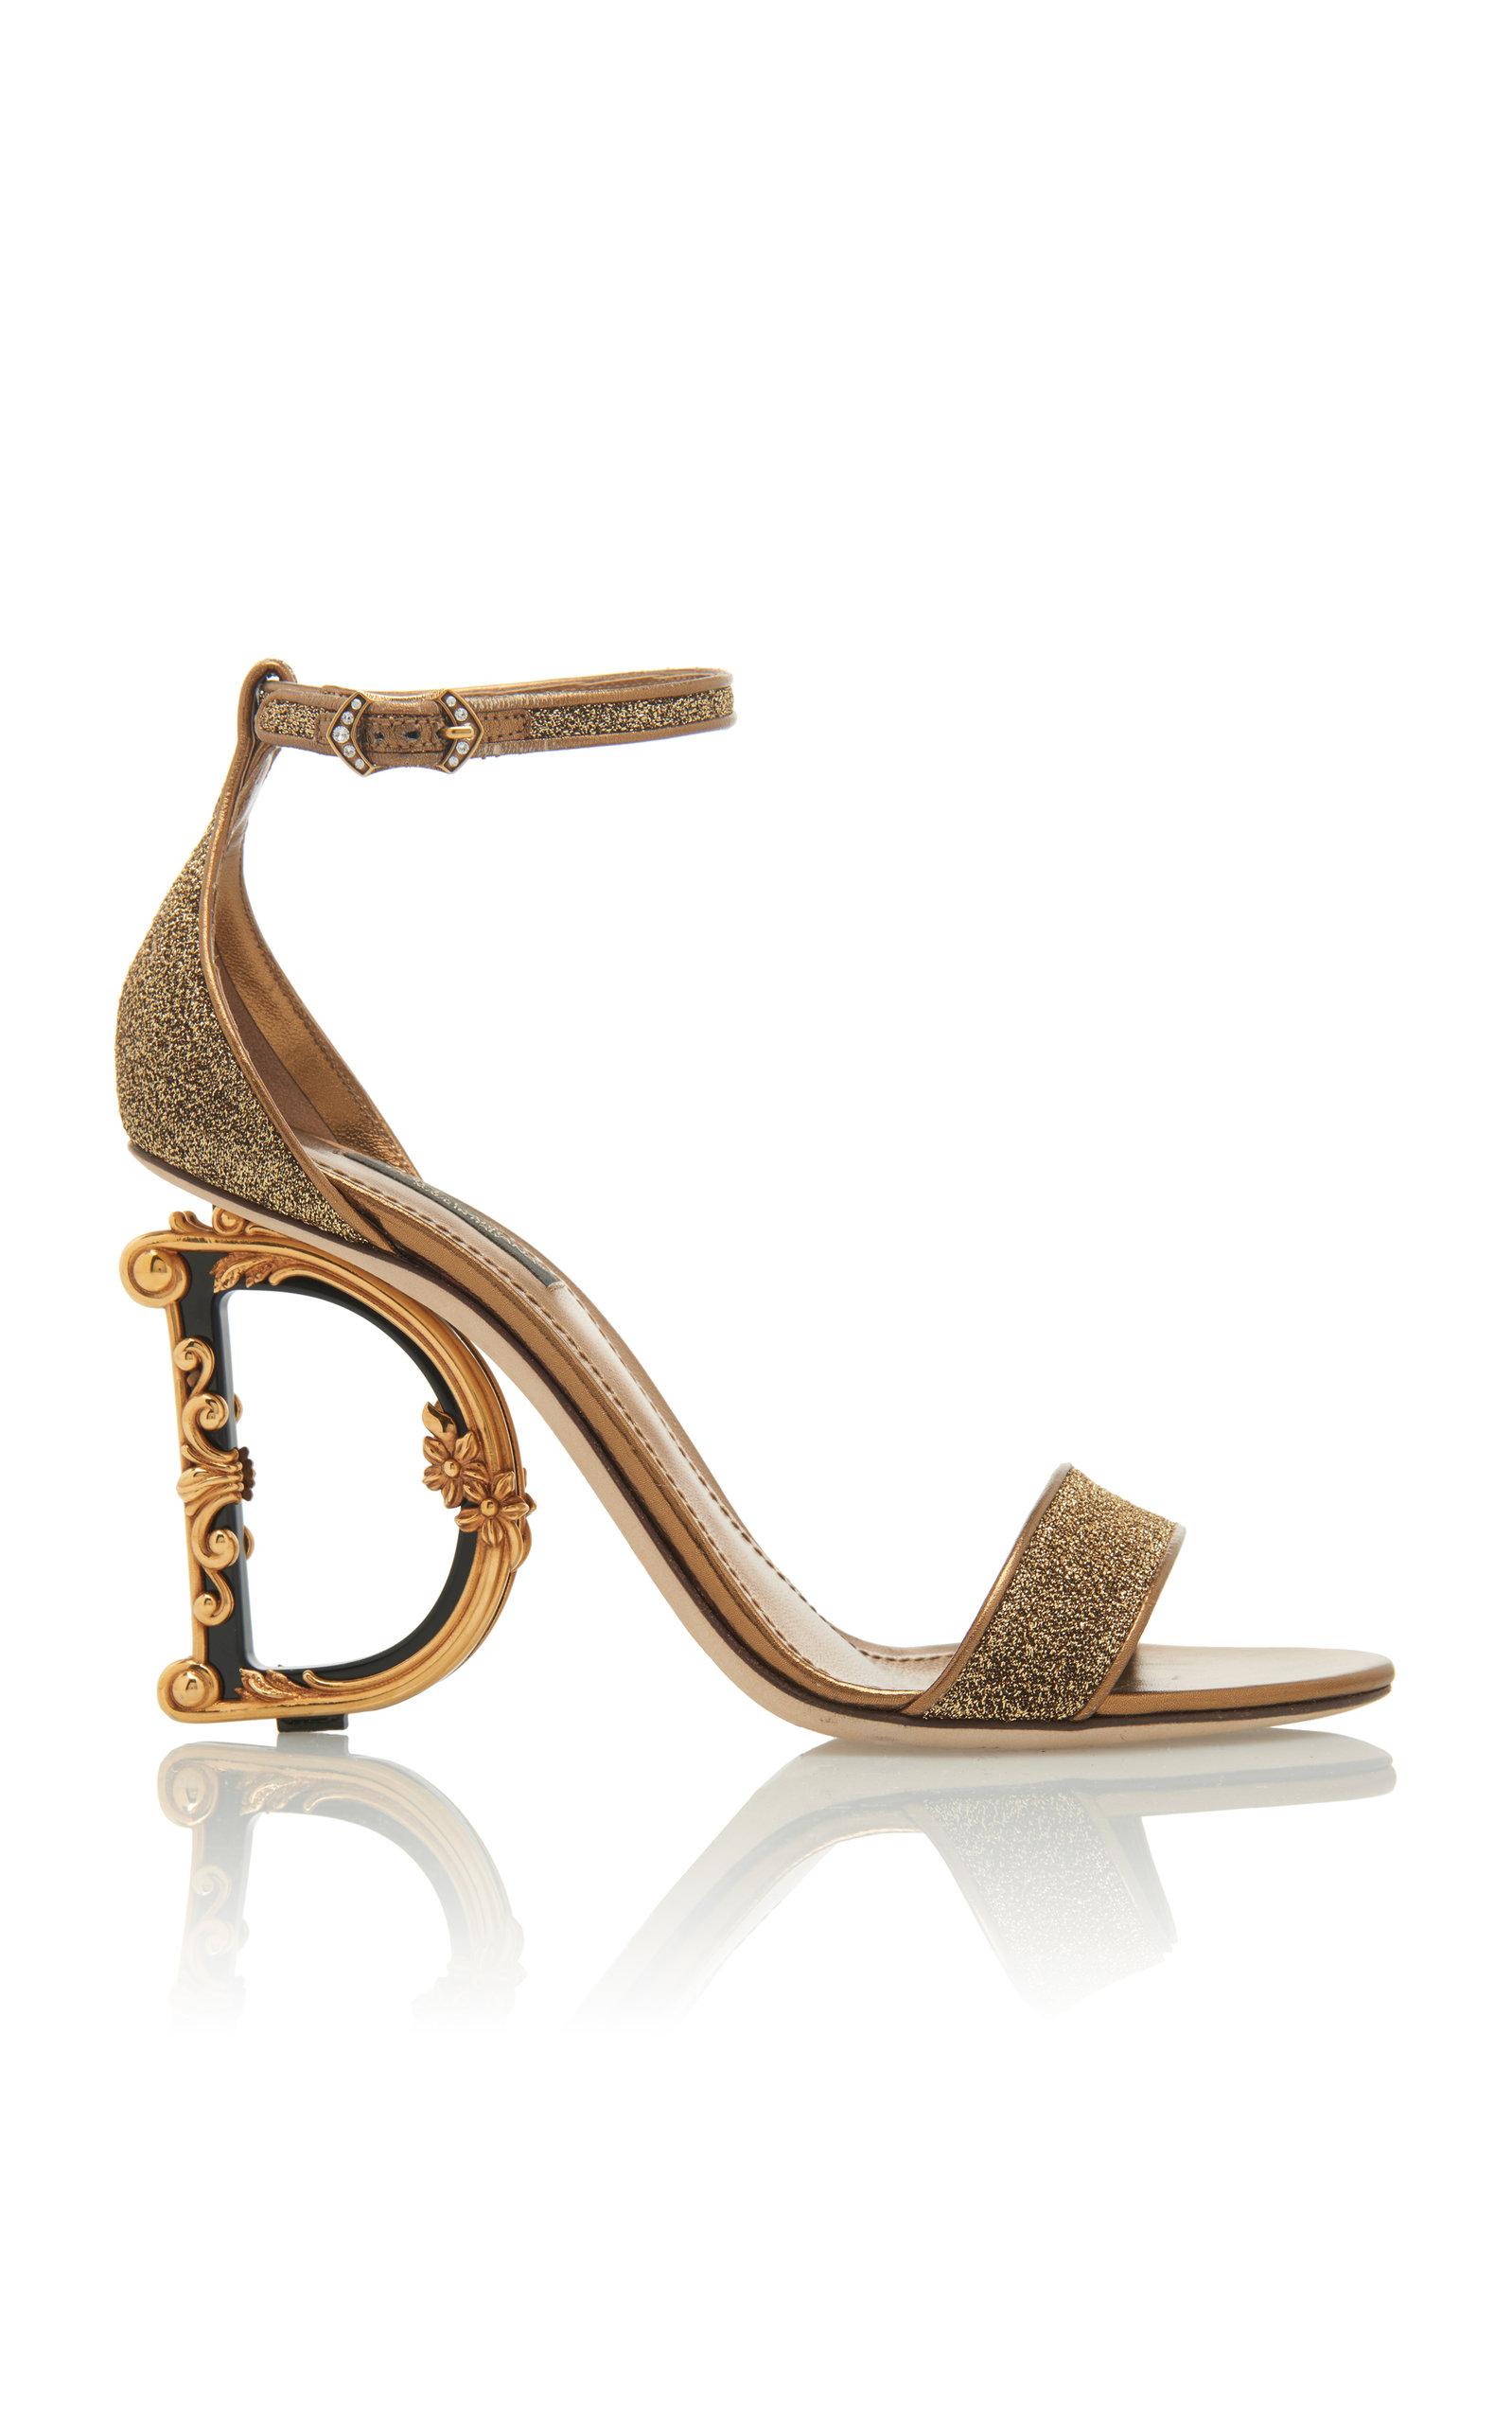 48531d0b7423 Dolce   GabbanaLogo Heel Lurex Sandals. CLOSE. Loading